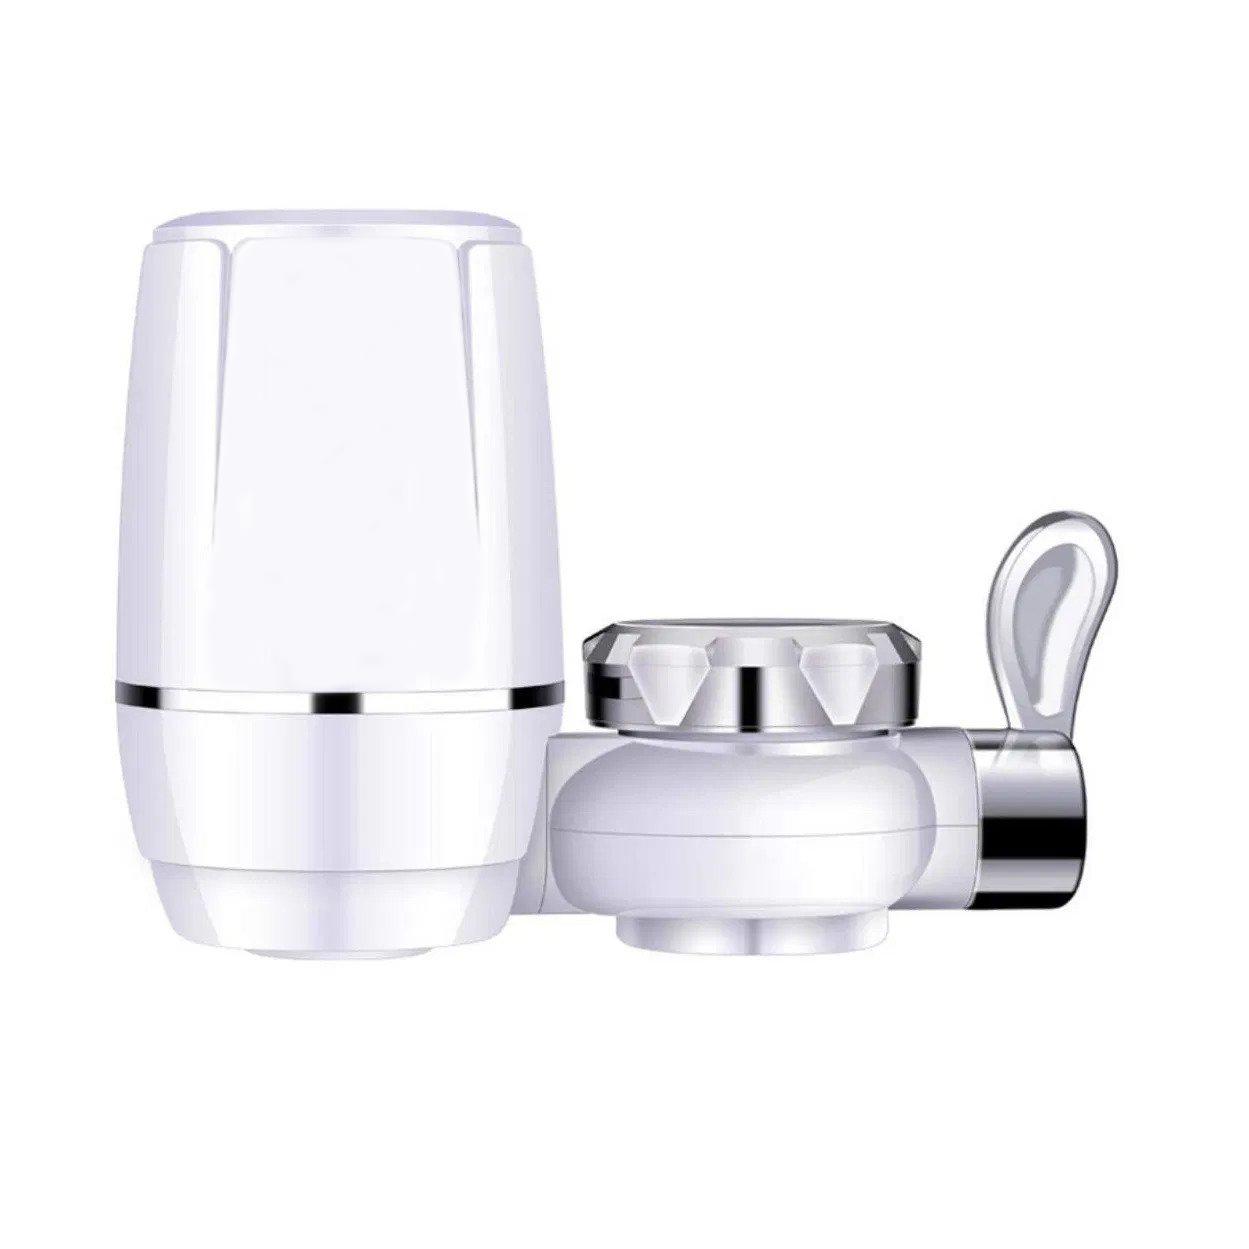 Purificator apa MRG C-ZSW-010A, Atasabil, Cu robinet, Cu filtru